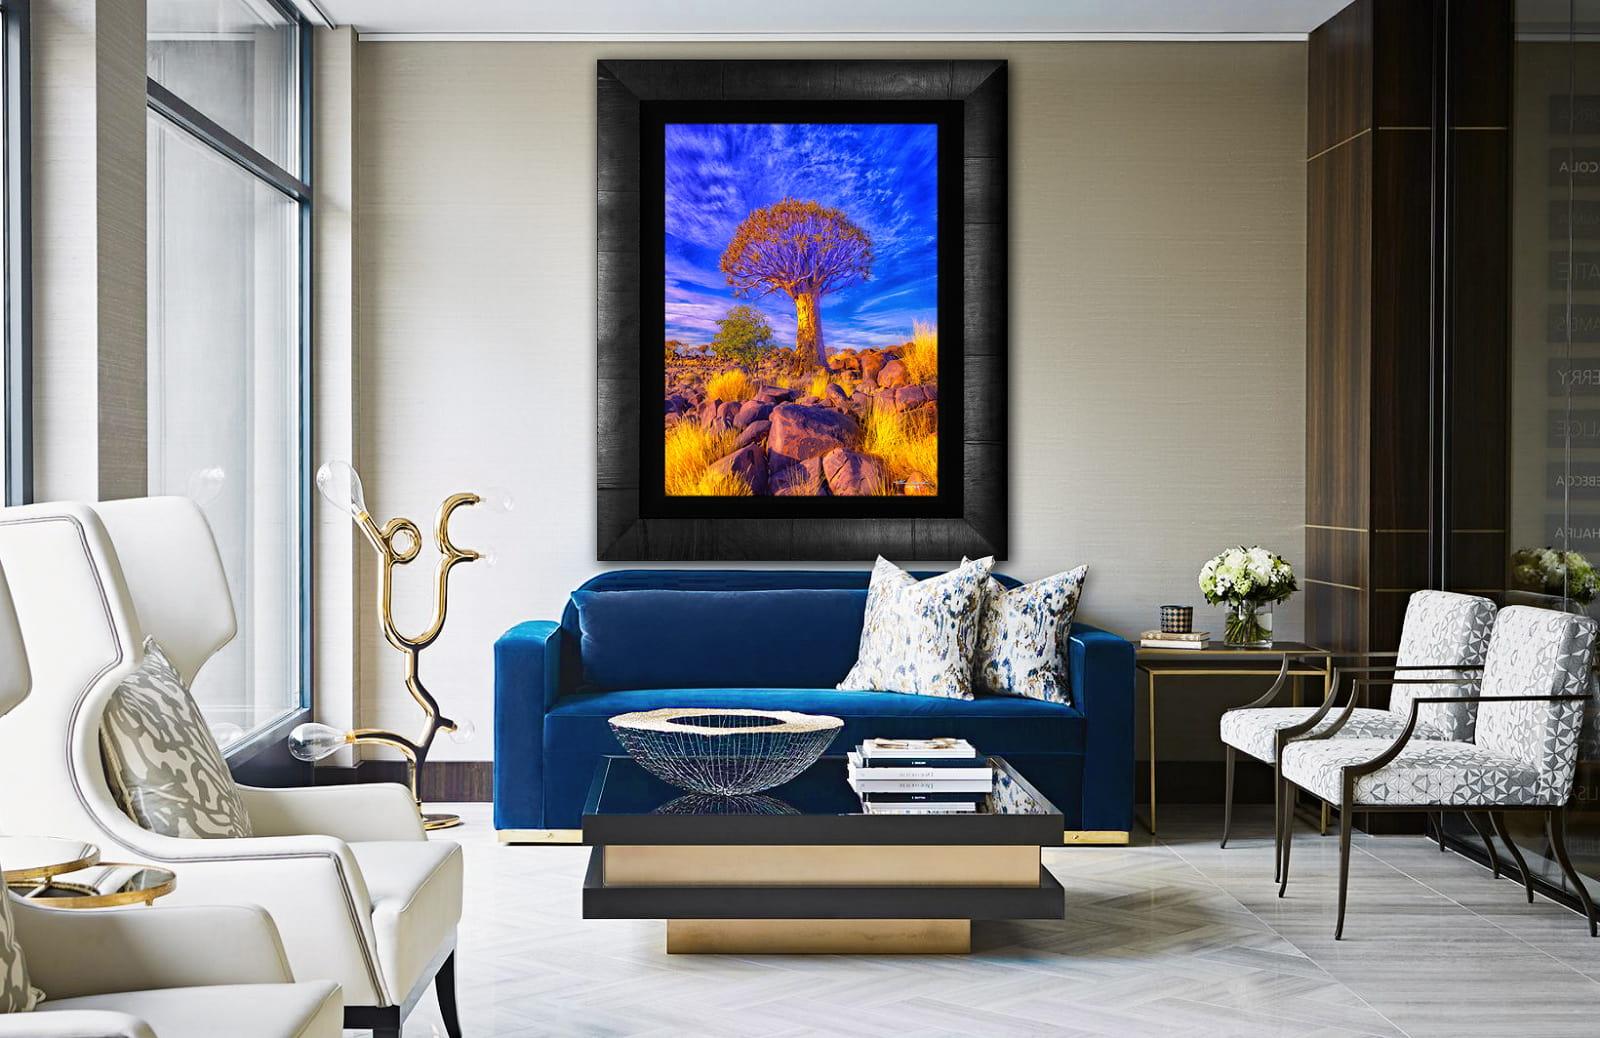 Alexander Vershinin, Luxury Limited Edition Art, photo